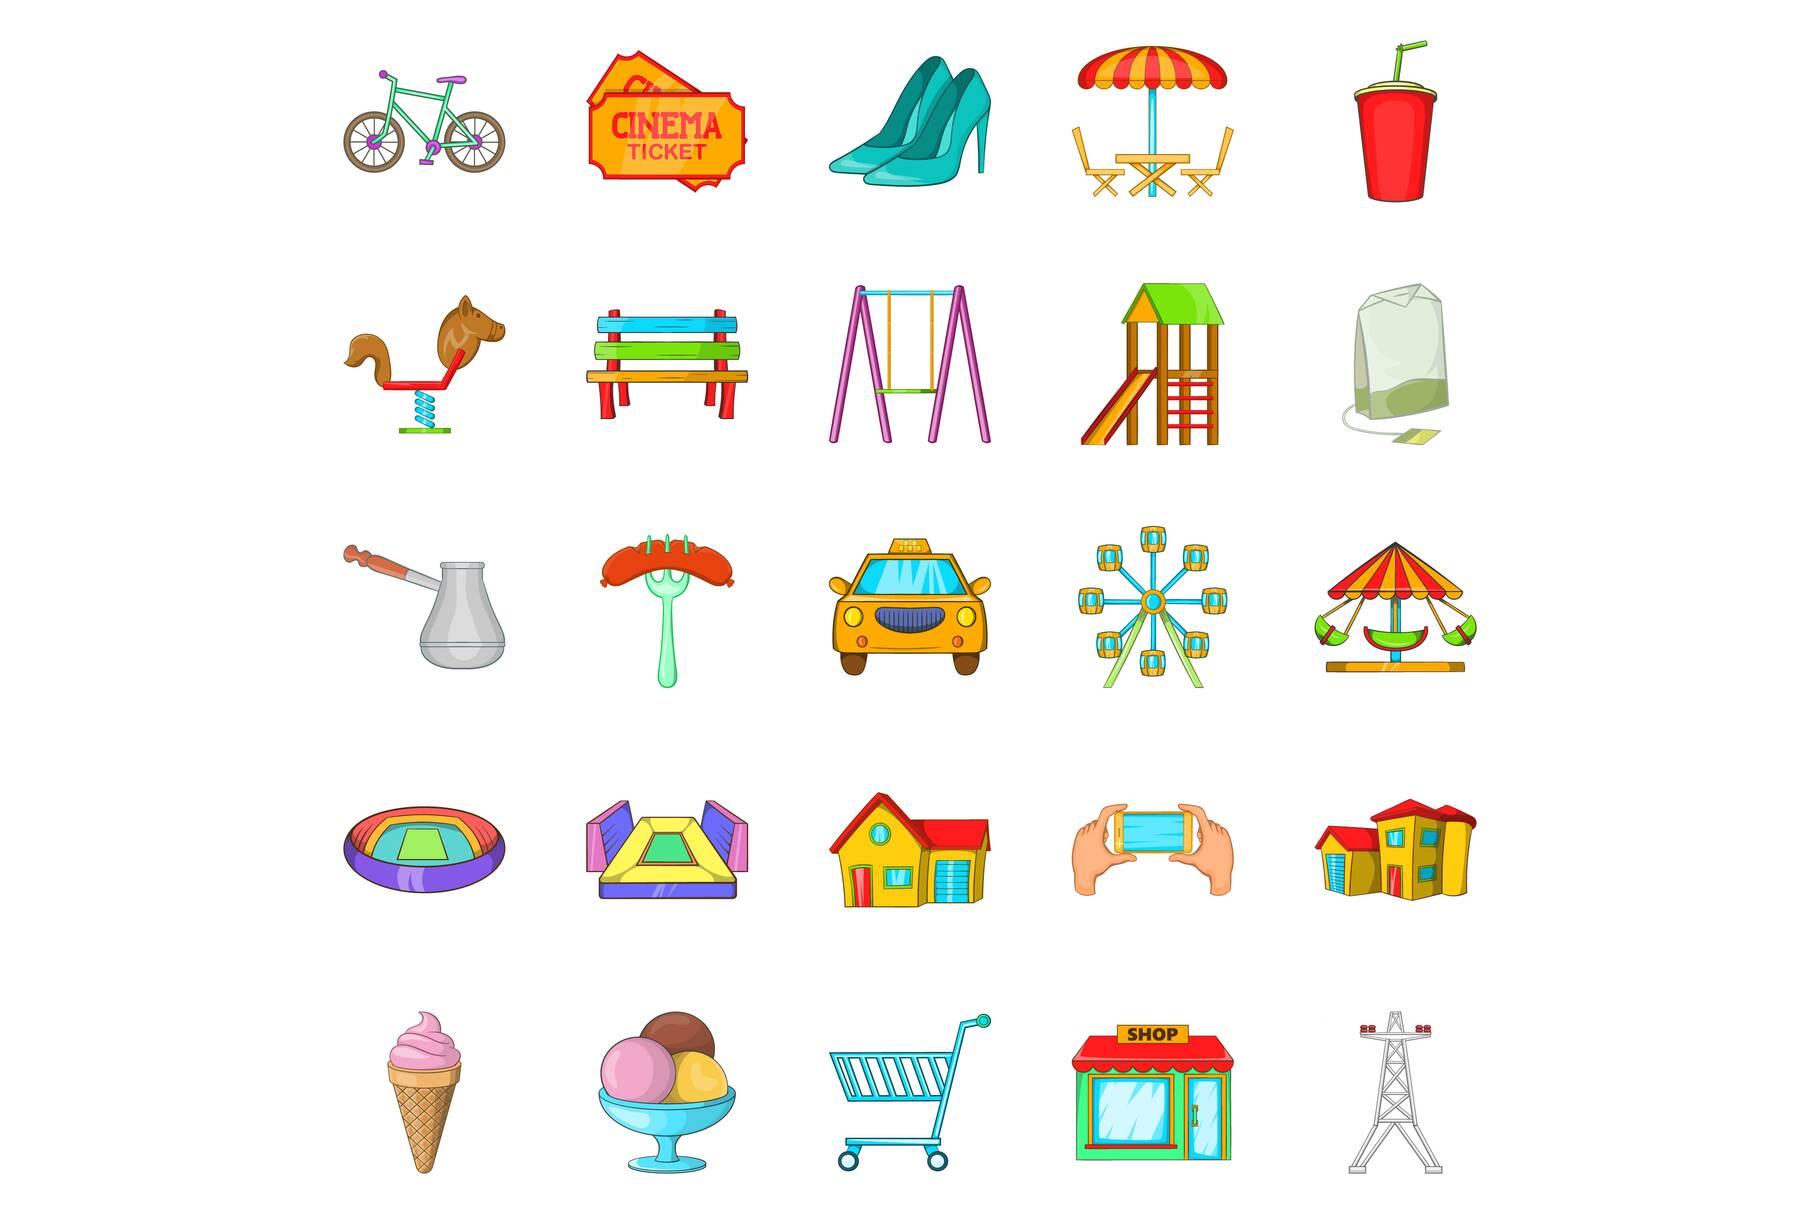 Playground icons set, cartoon style example image 1